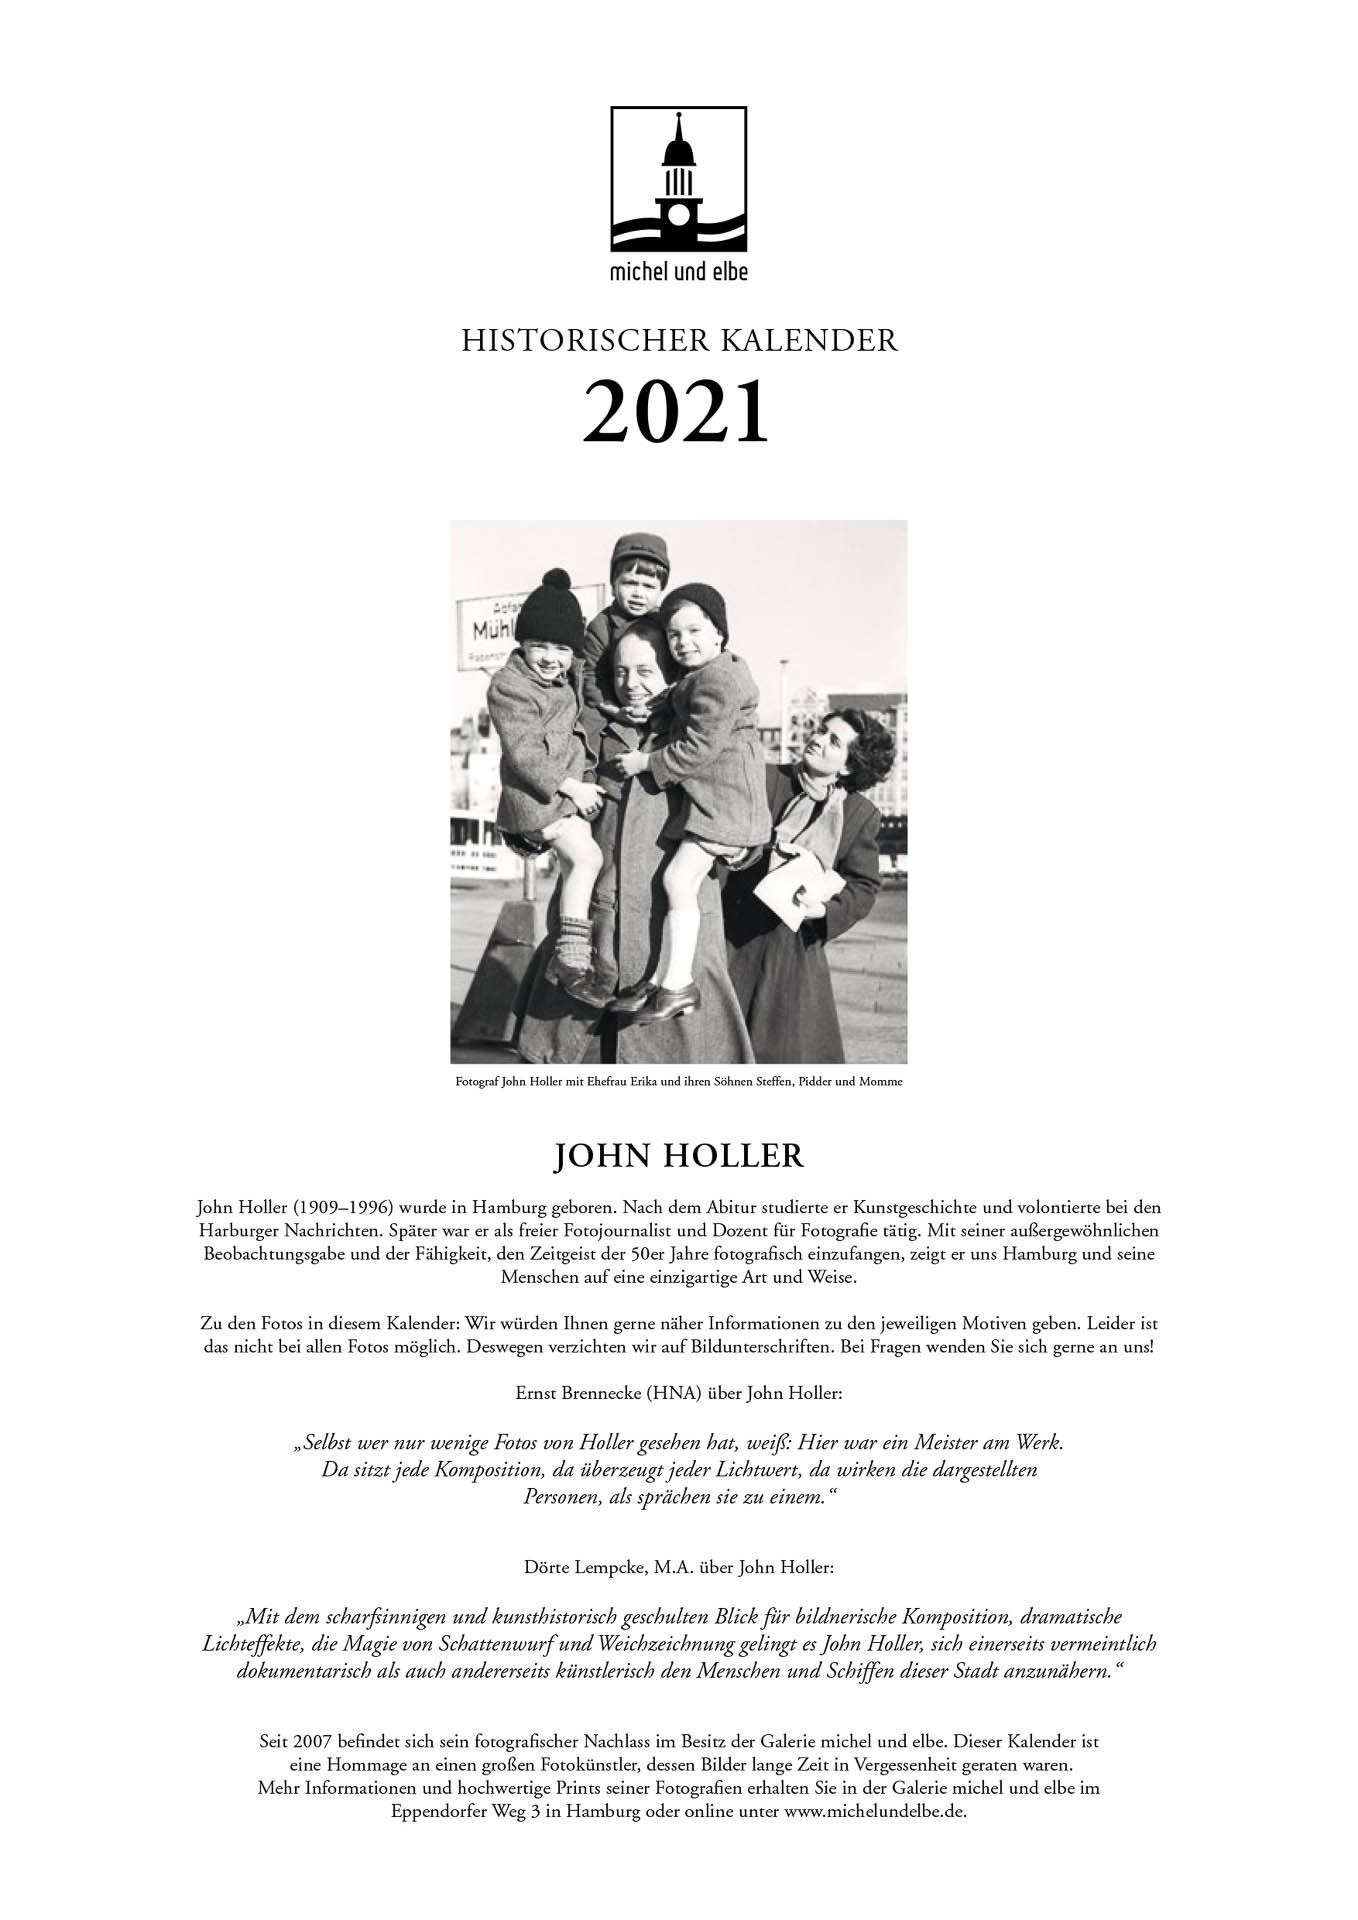 kalender_hamburg_Historisch_2021_02